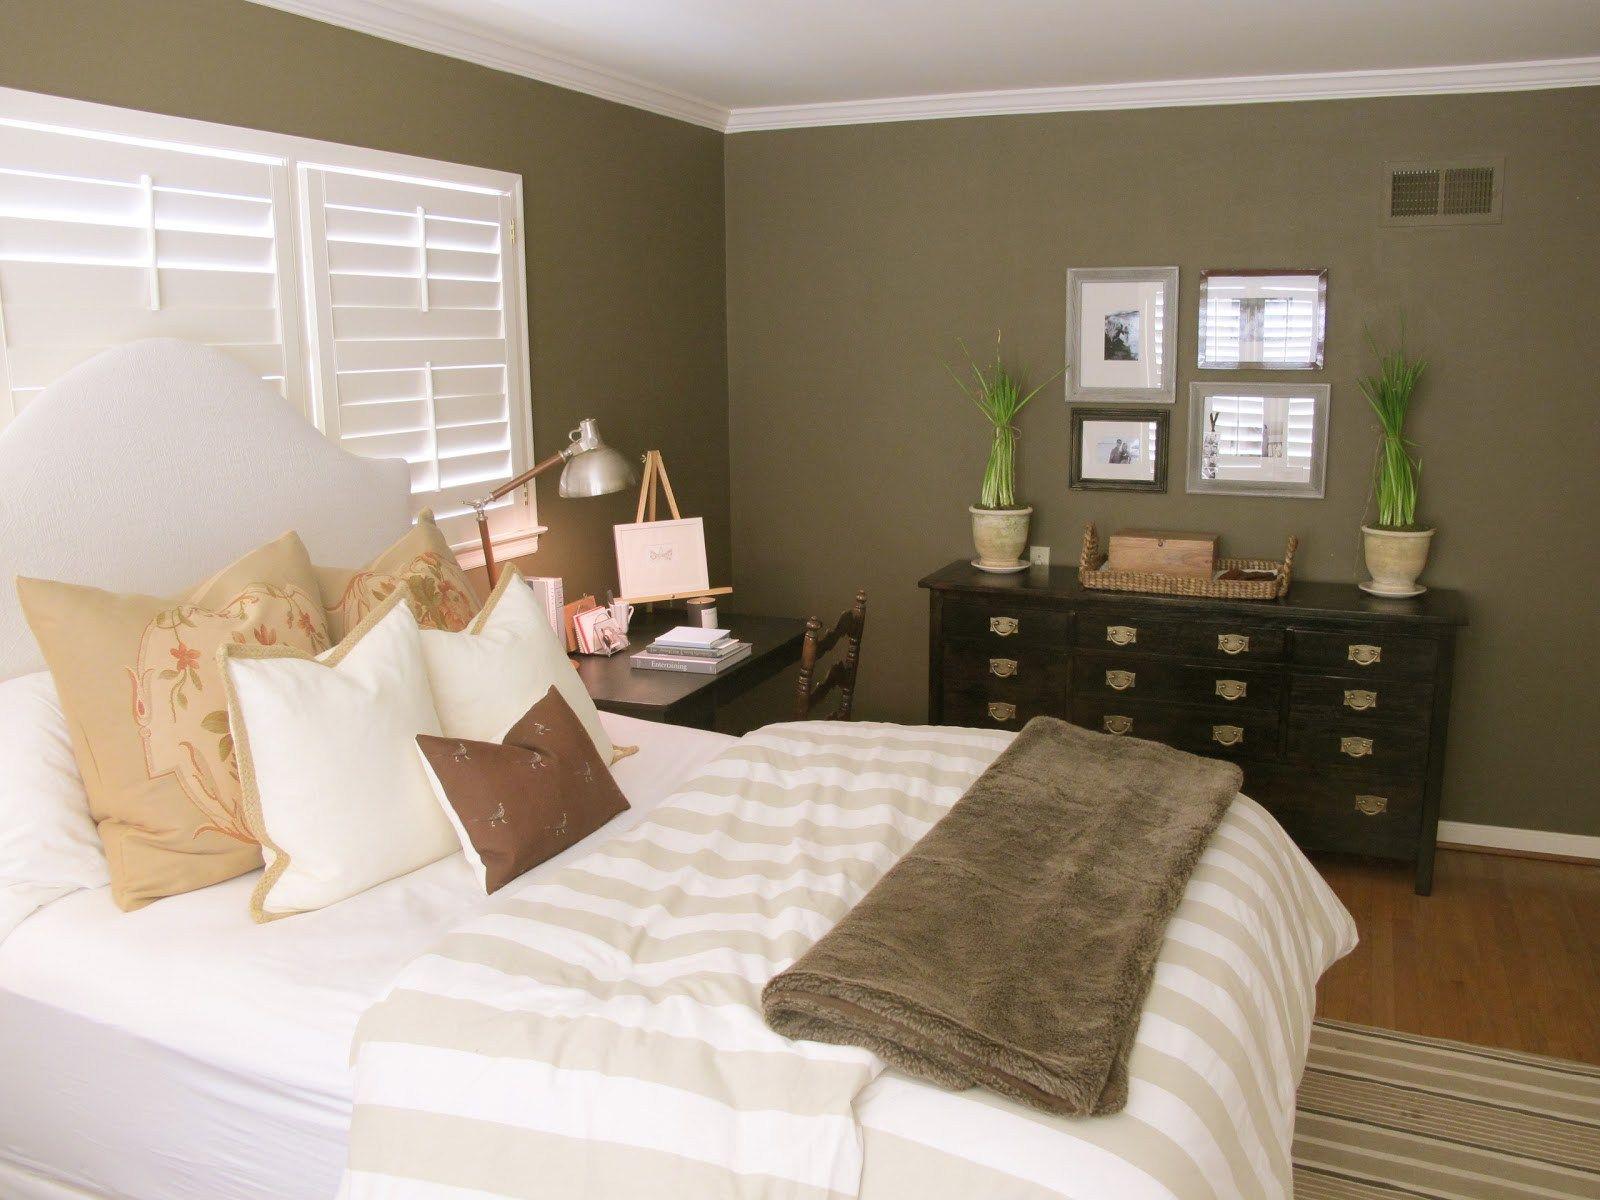 Bedroom Makeover Home Decor Diy Bedroom Makeover Diy Bedroom Cheap